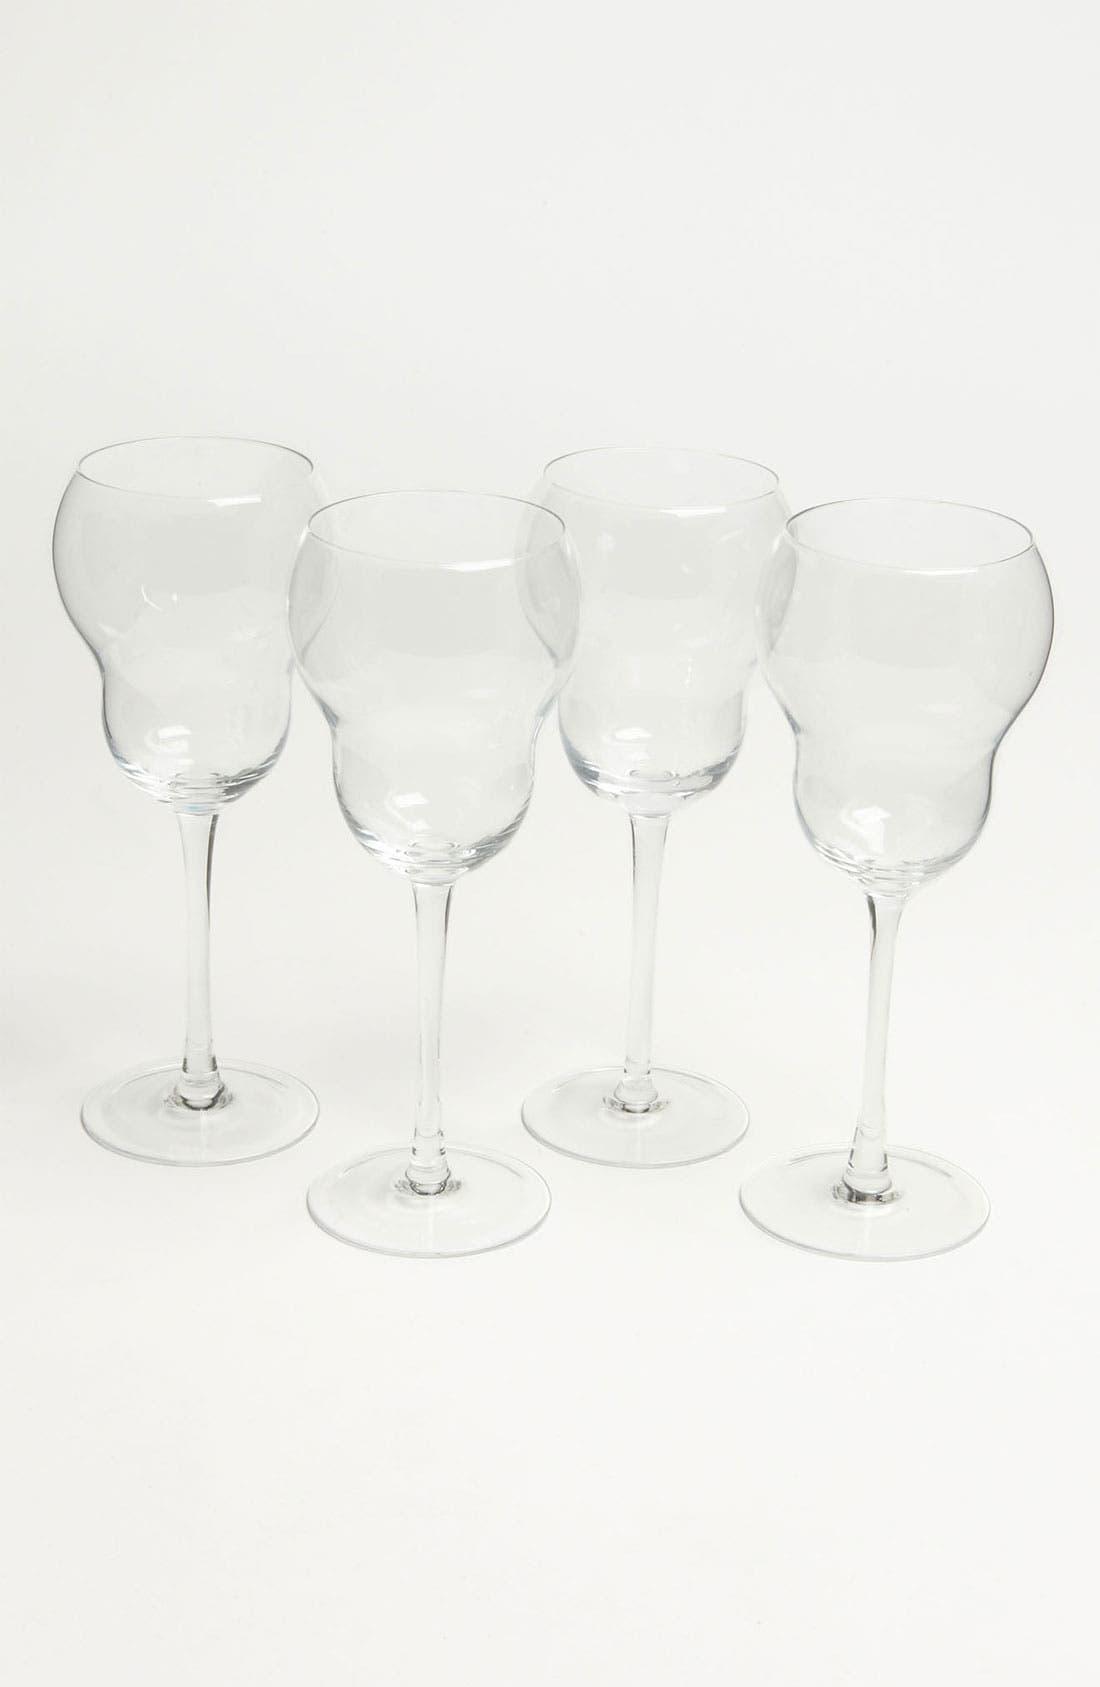 Alternate Image 1 Selected - 'Bubble' White Wine Glasses (Set of 4)